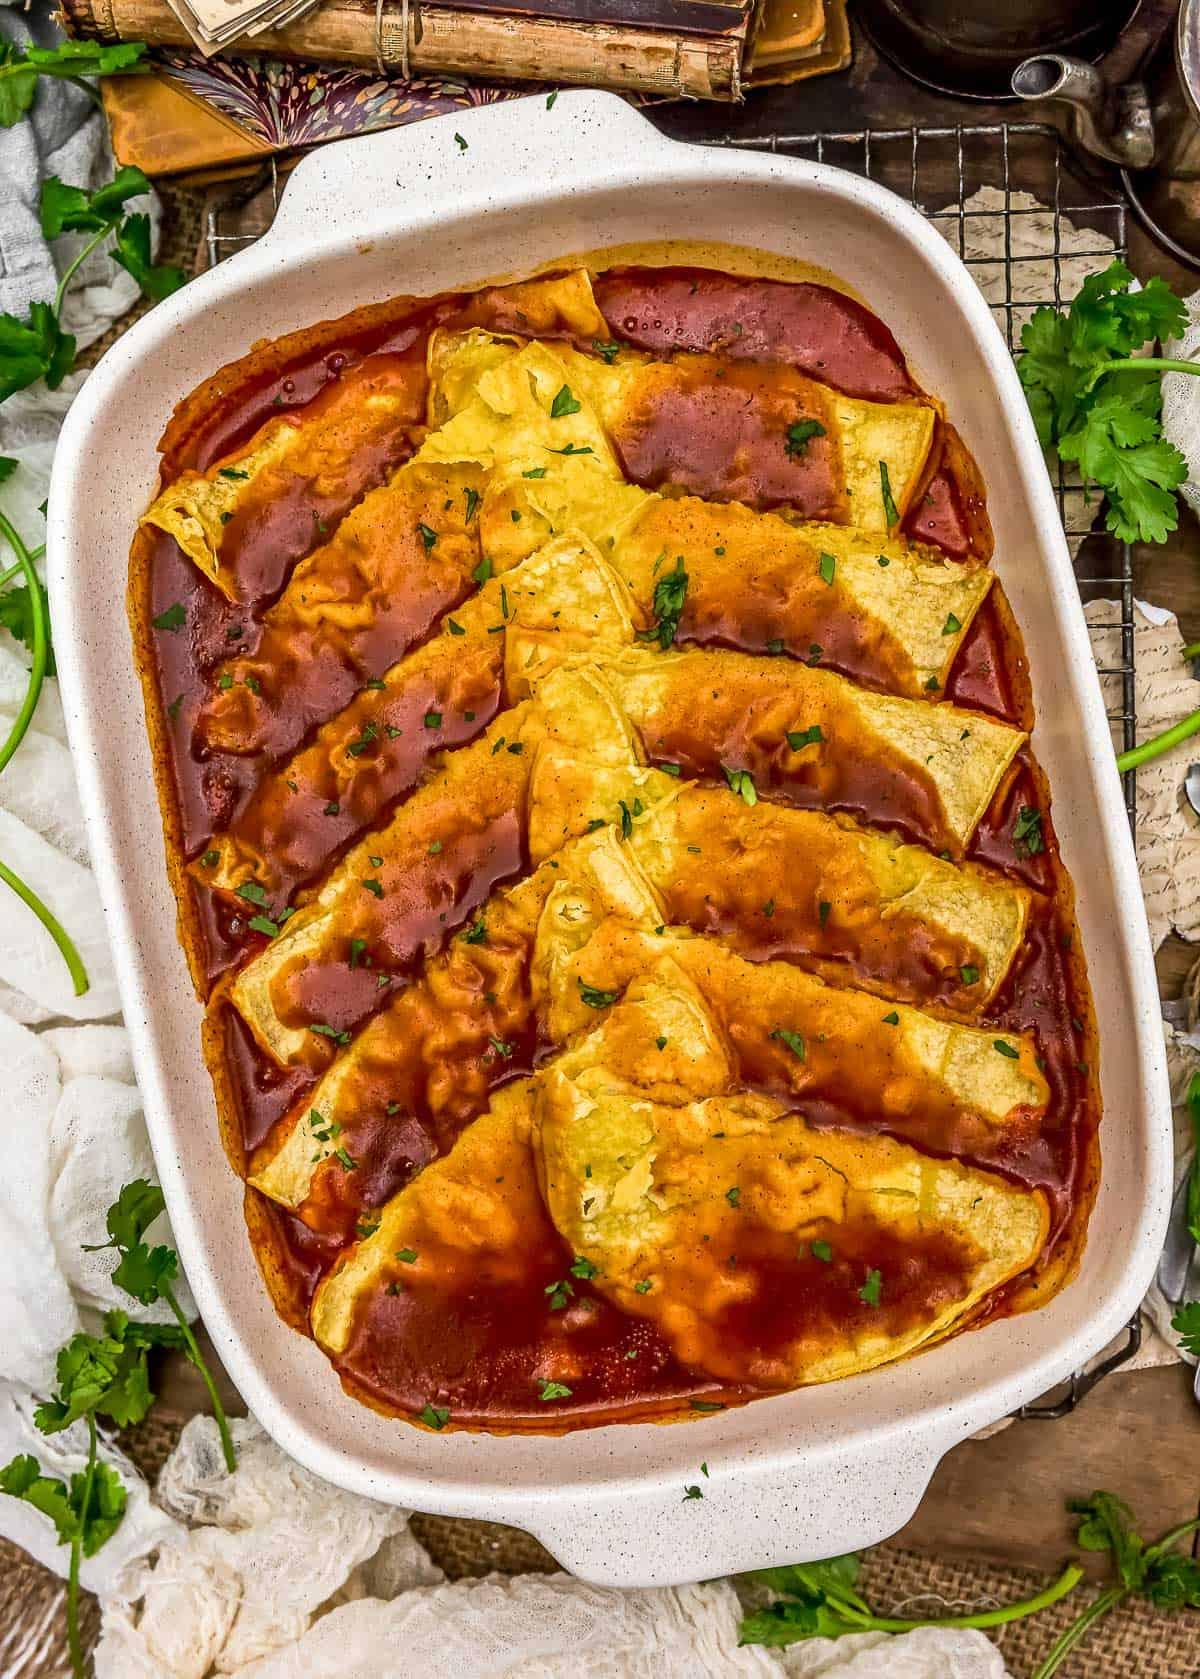 Vegan Enchilada Quesadilla Bake in a casserole dish